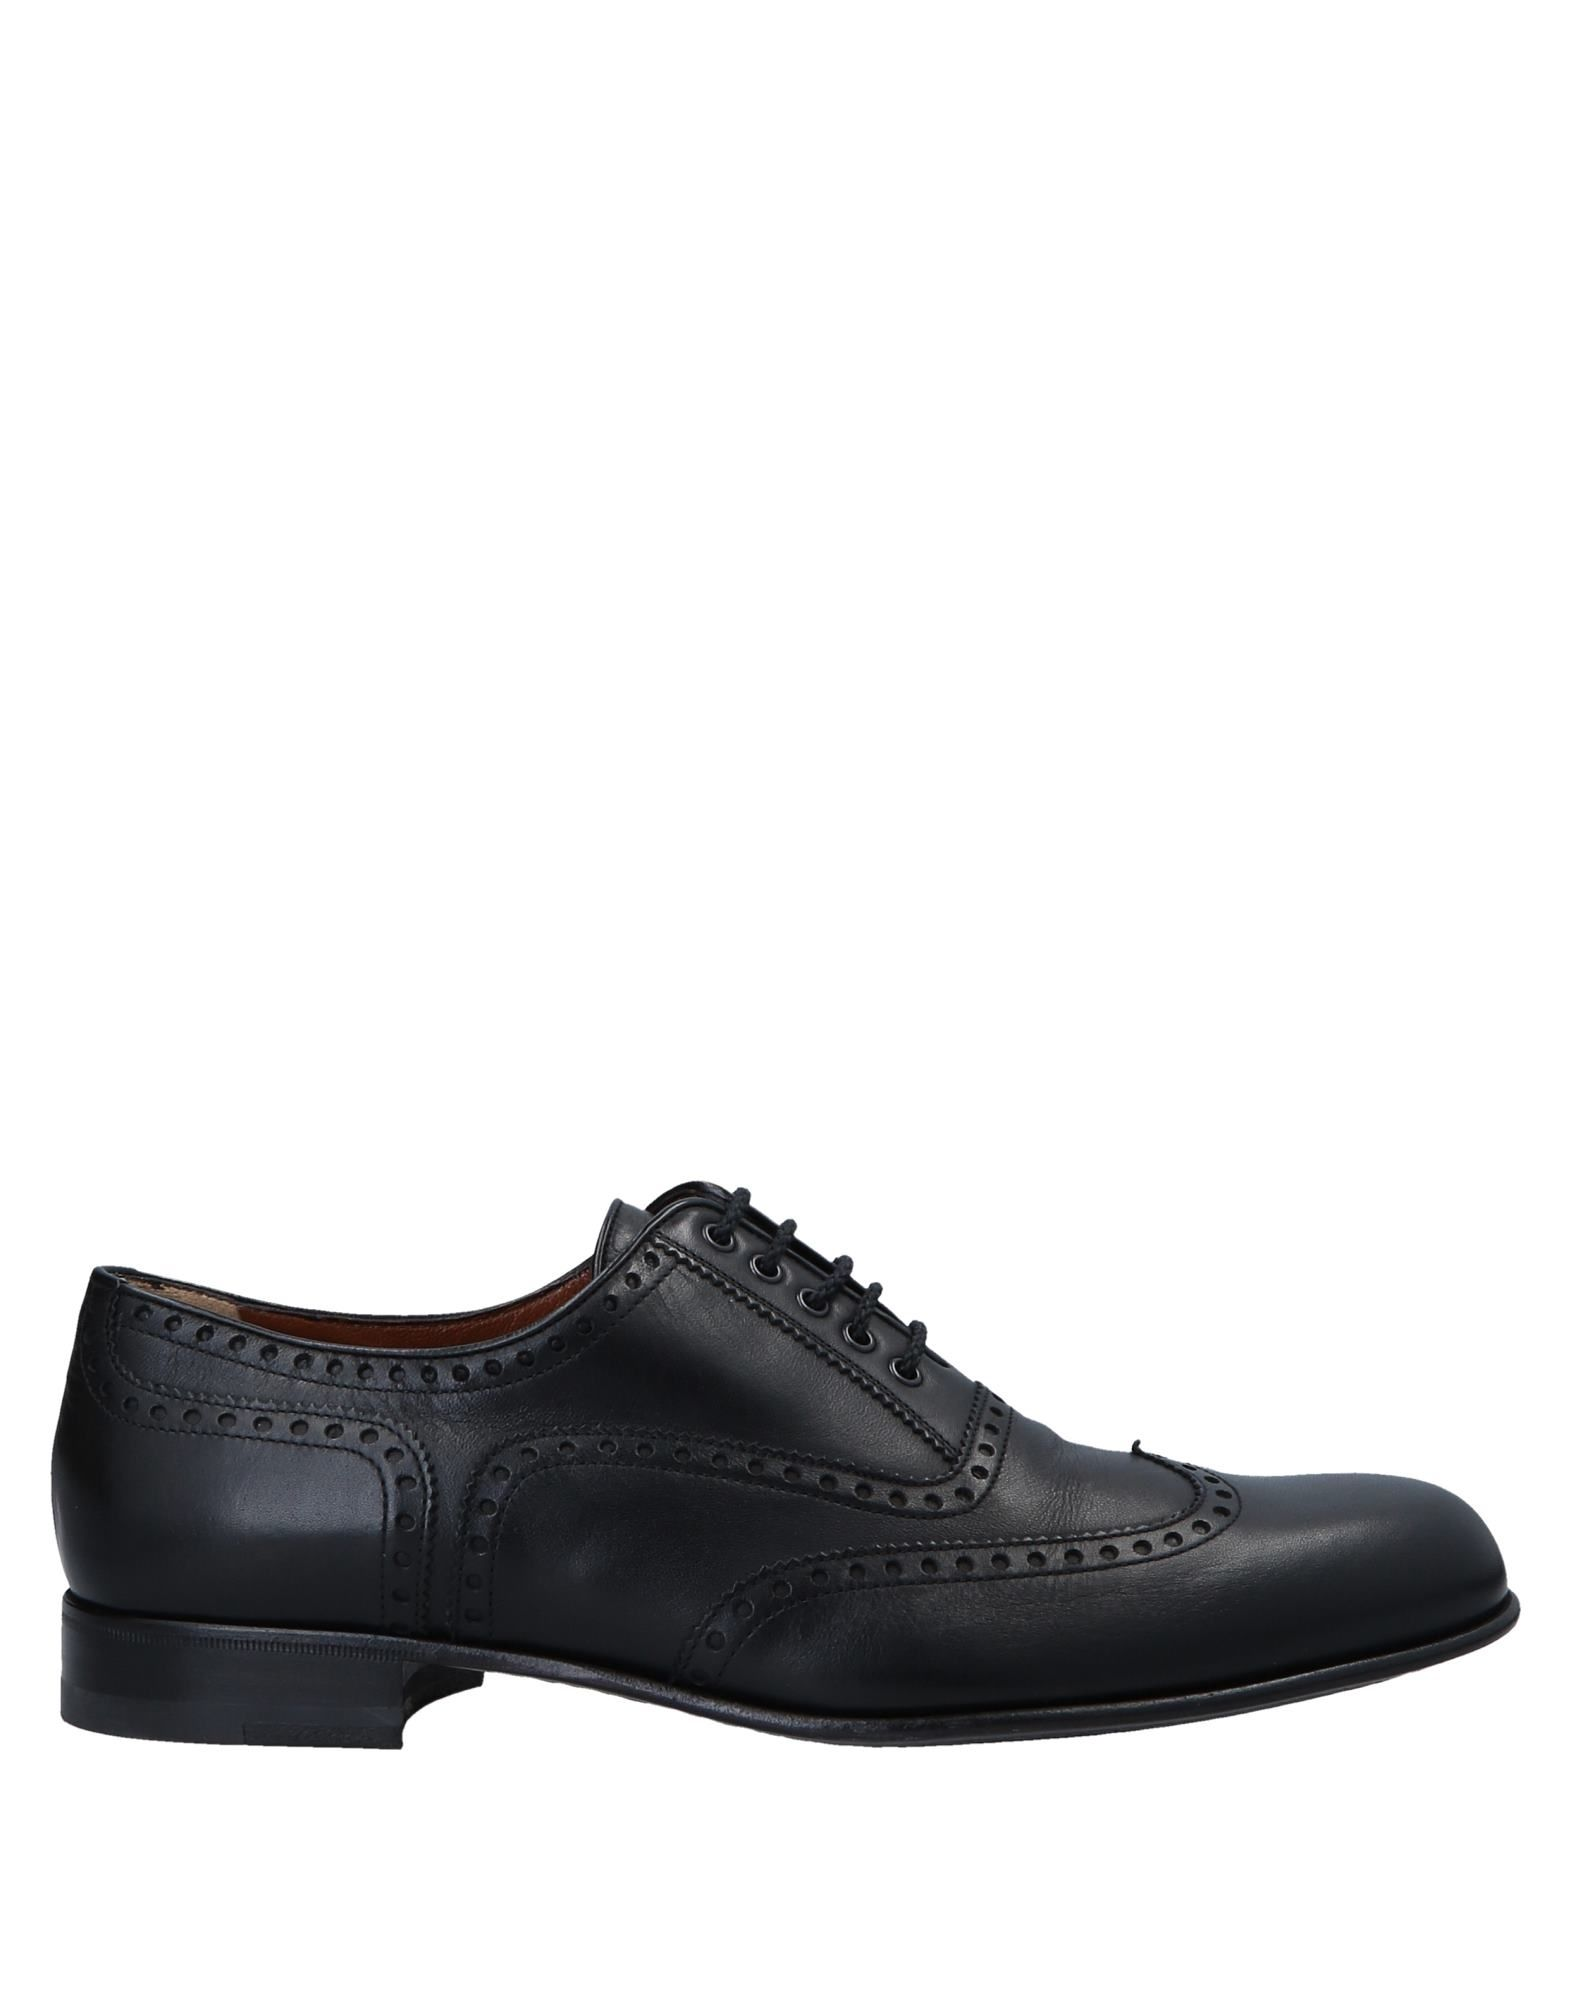 A.Testoni Schnürschuhe Herren  11555473GQ Gute Qualität beliebte Schuhe